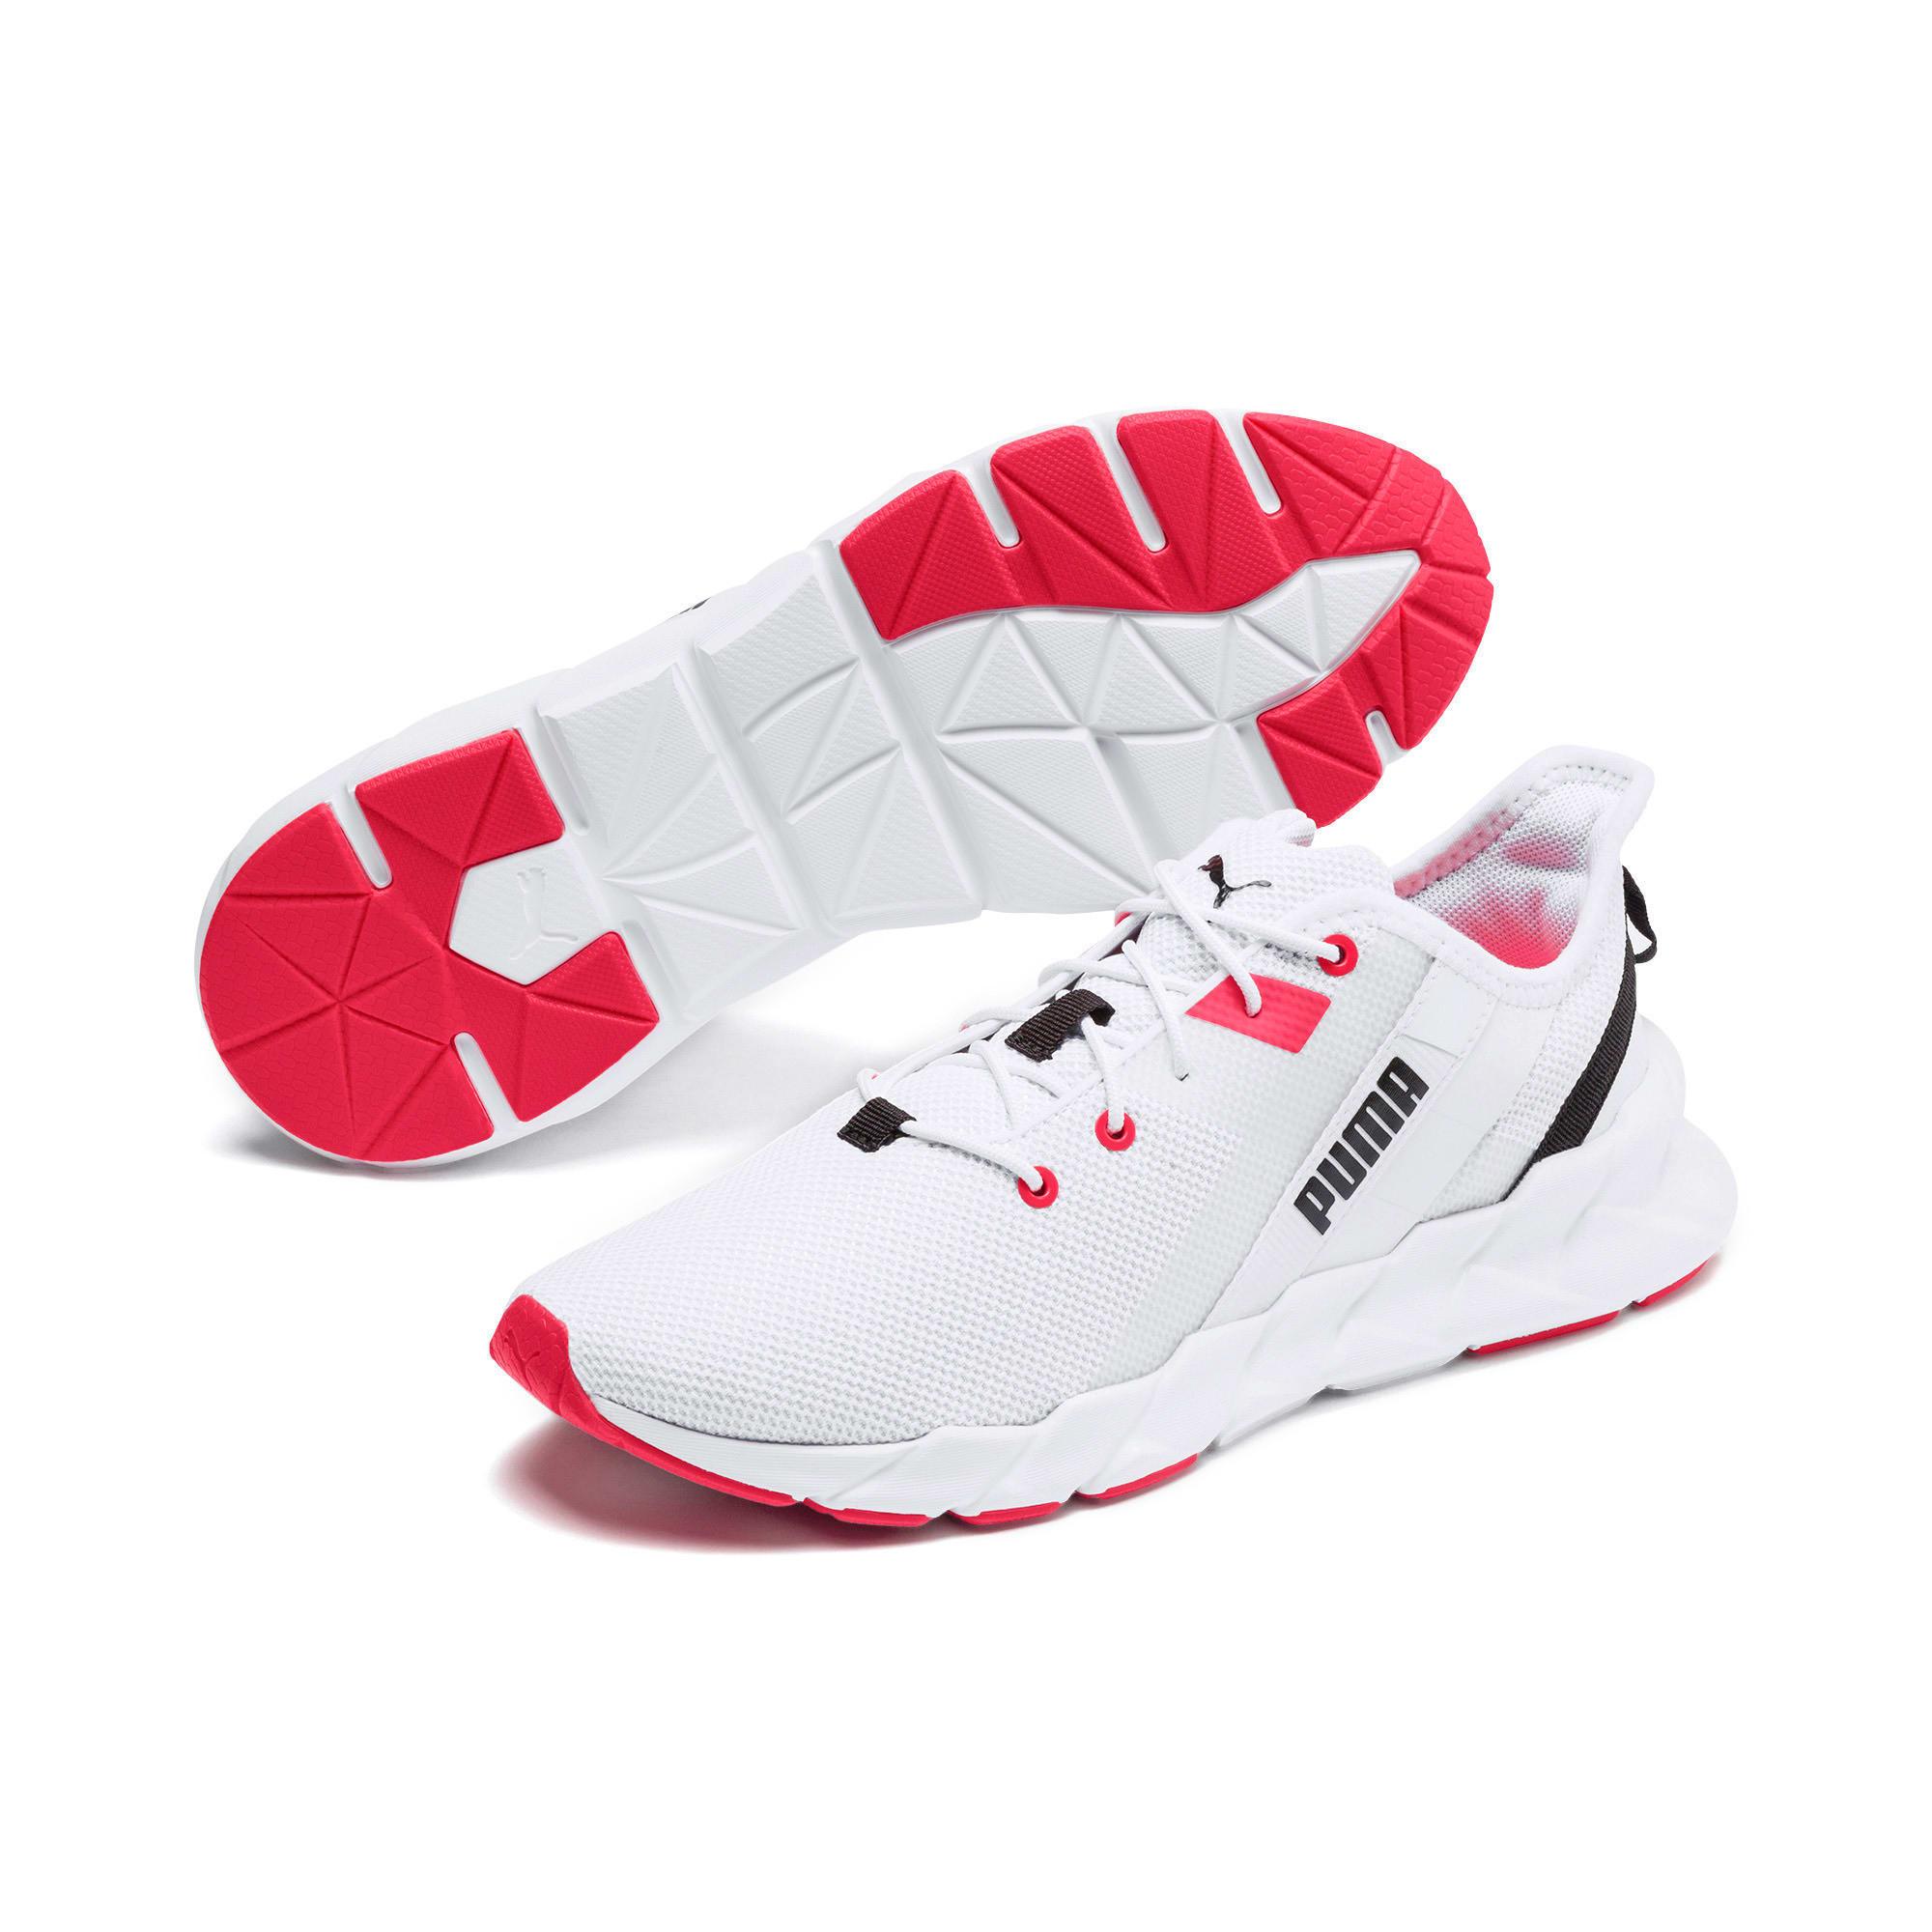 Thumbnail 3 of Weave XT Women's Training Shoes, Puma White-Pink Alert, medium